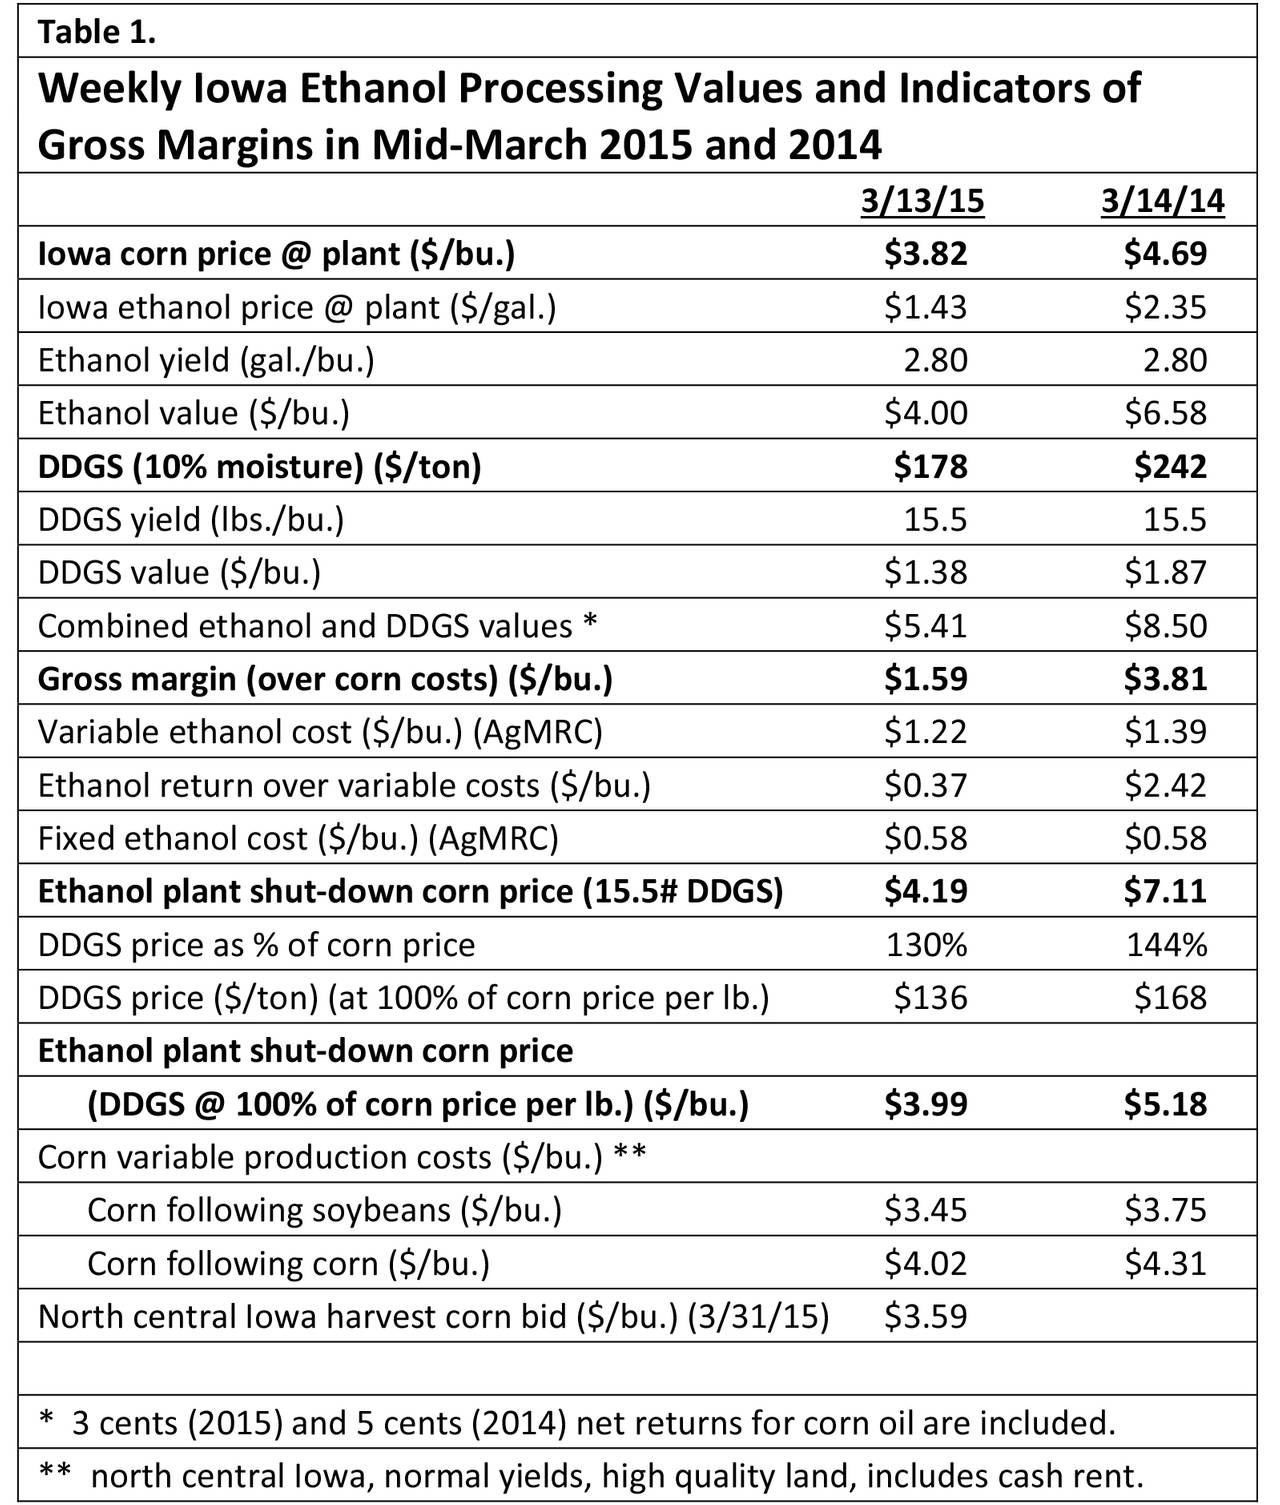 Corn Cost Per Acre Spreadsheet Spreadsheet Downloa Corn